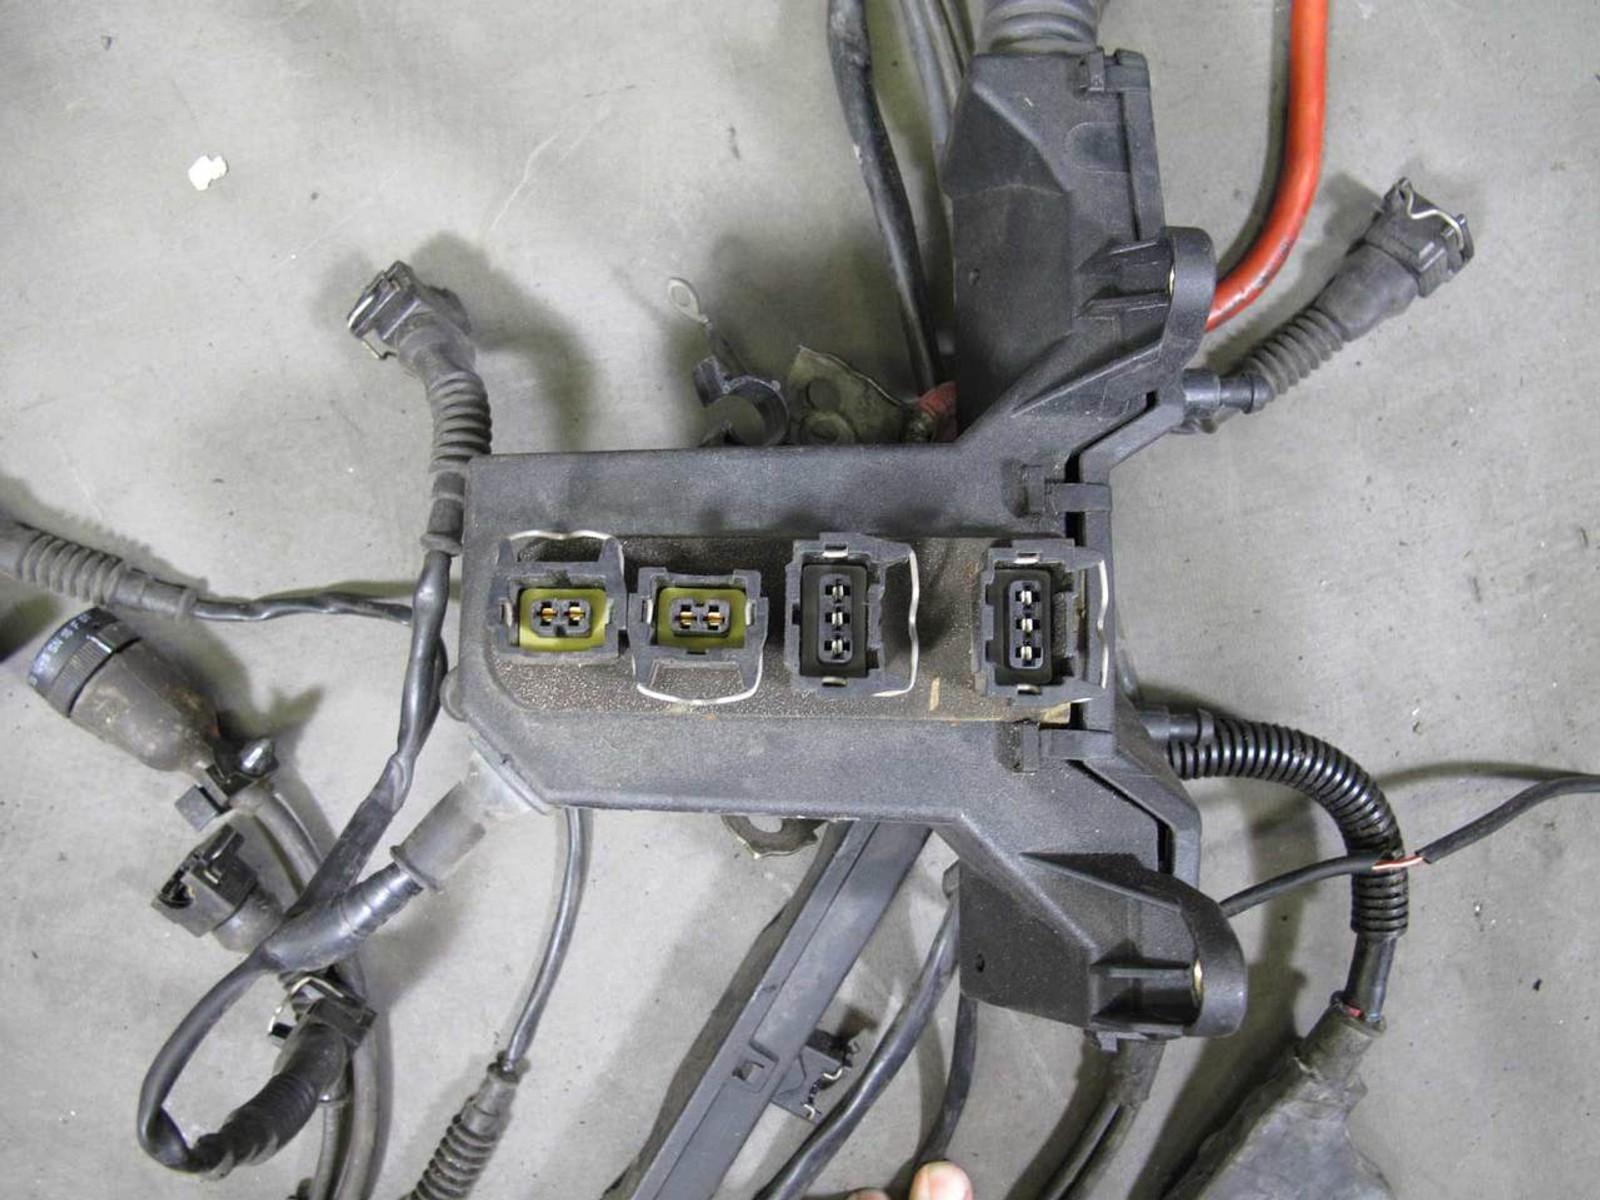 1995 bmw wiring harness wiring diagram BMW Wiring Diagram Symbols 1995 bmw e36 318i m42 4 cylinder engine wiring harness for auto trans oe used1995 bmw